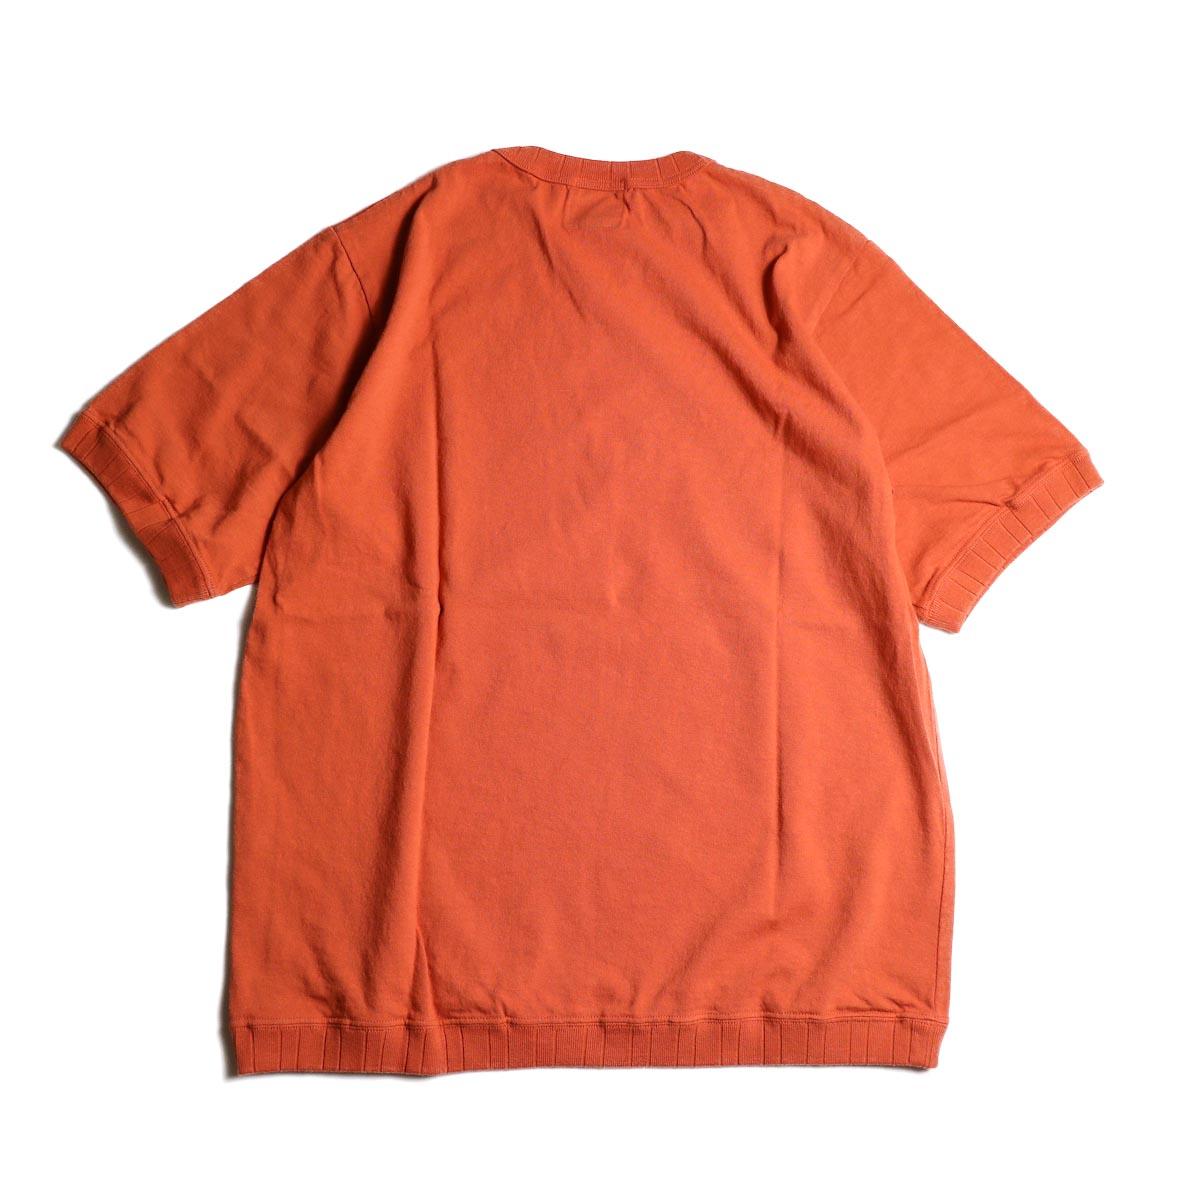 Jackman / Rib T-Shirt (Sunset Orange)  背面